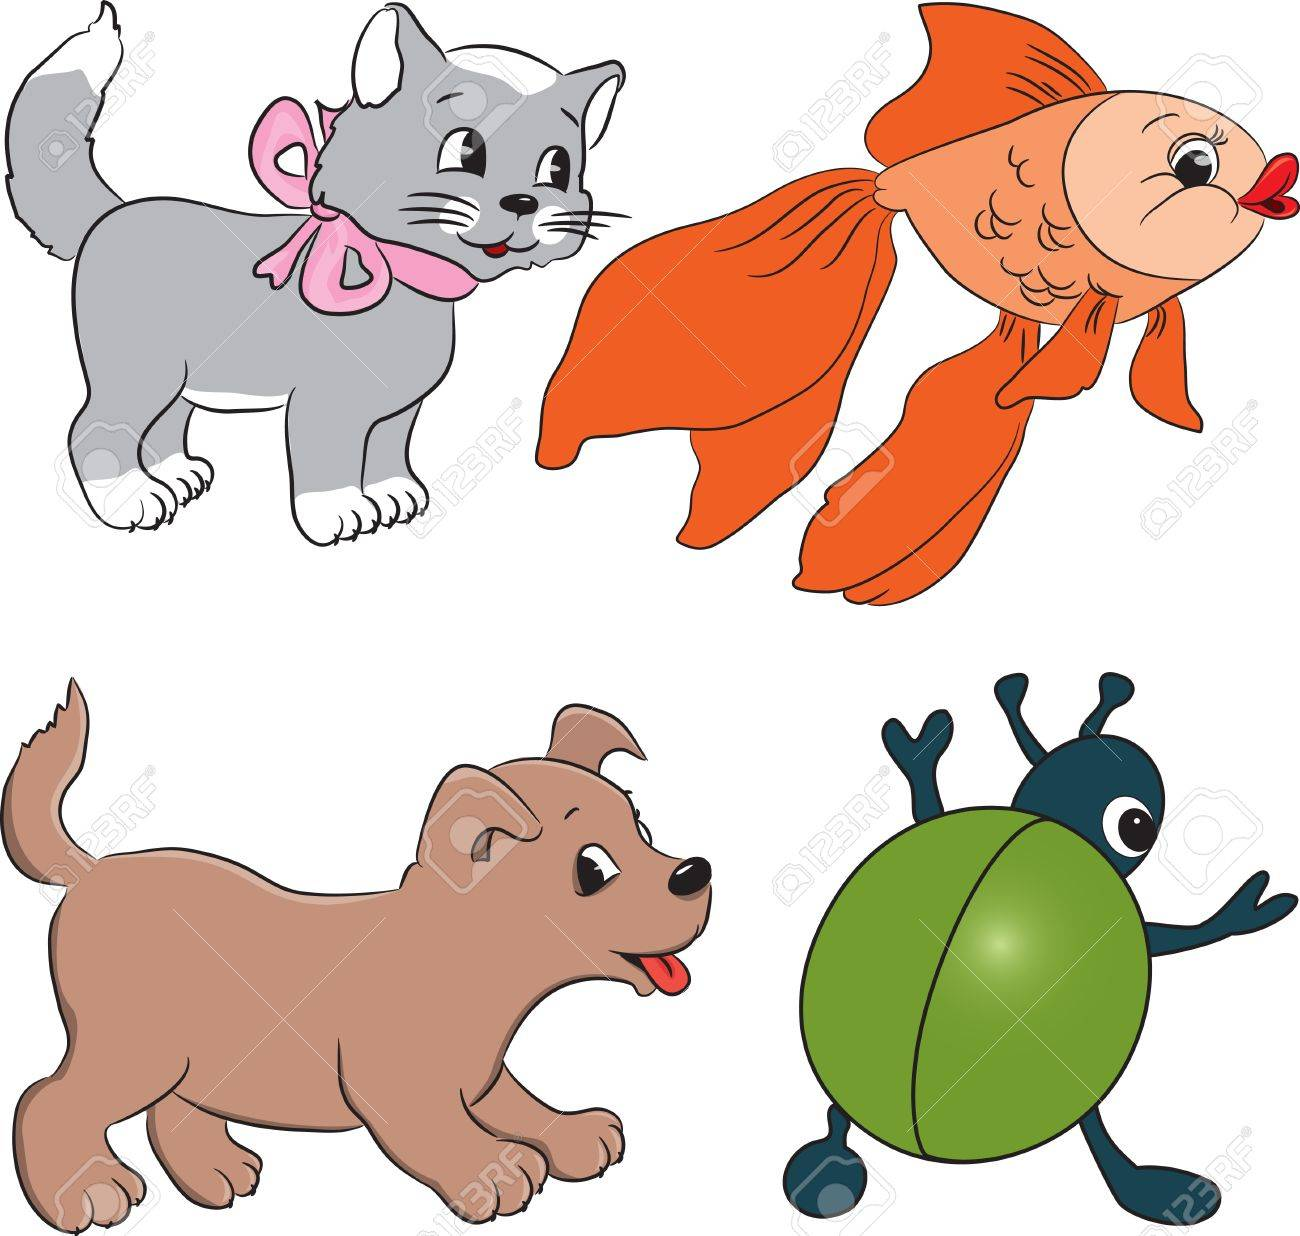 Cartoon animals Stock Vector - 15462909